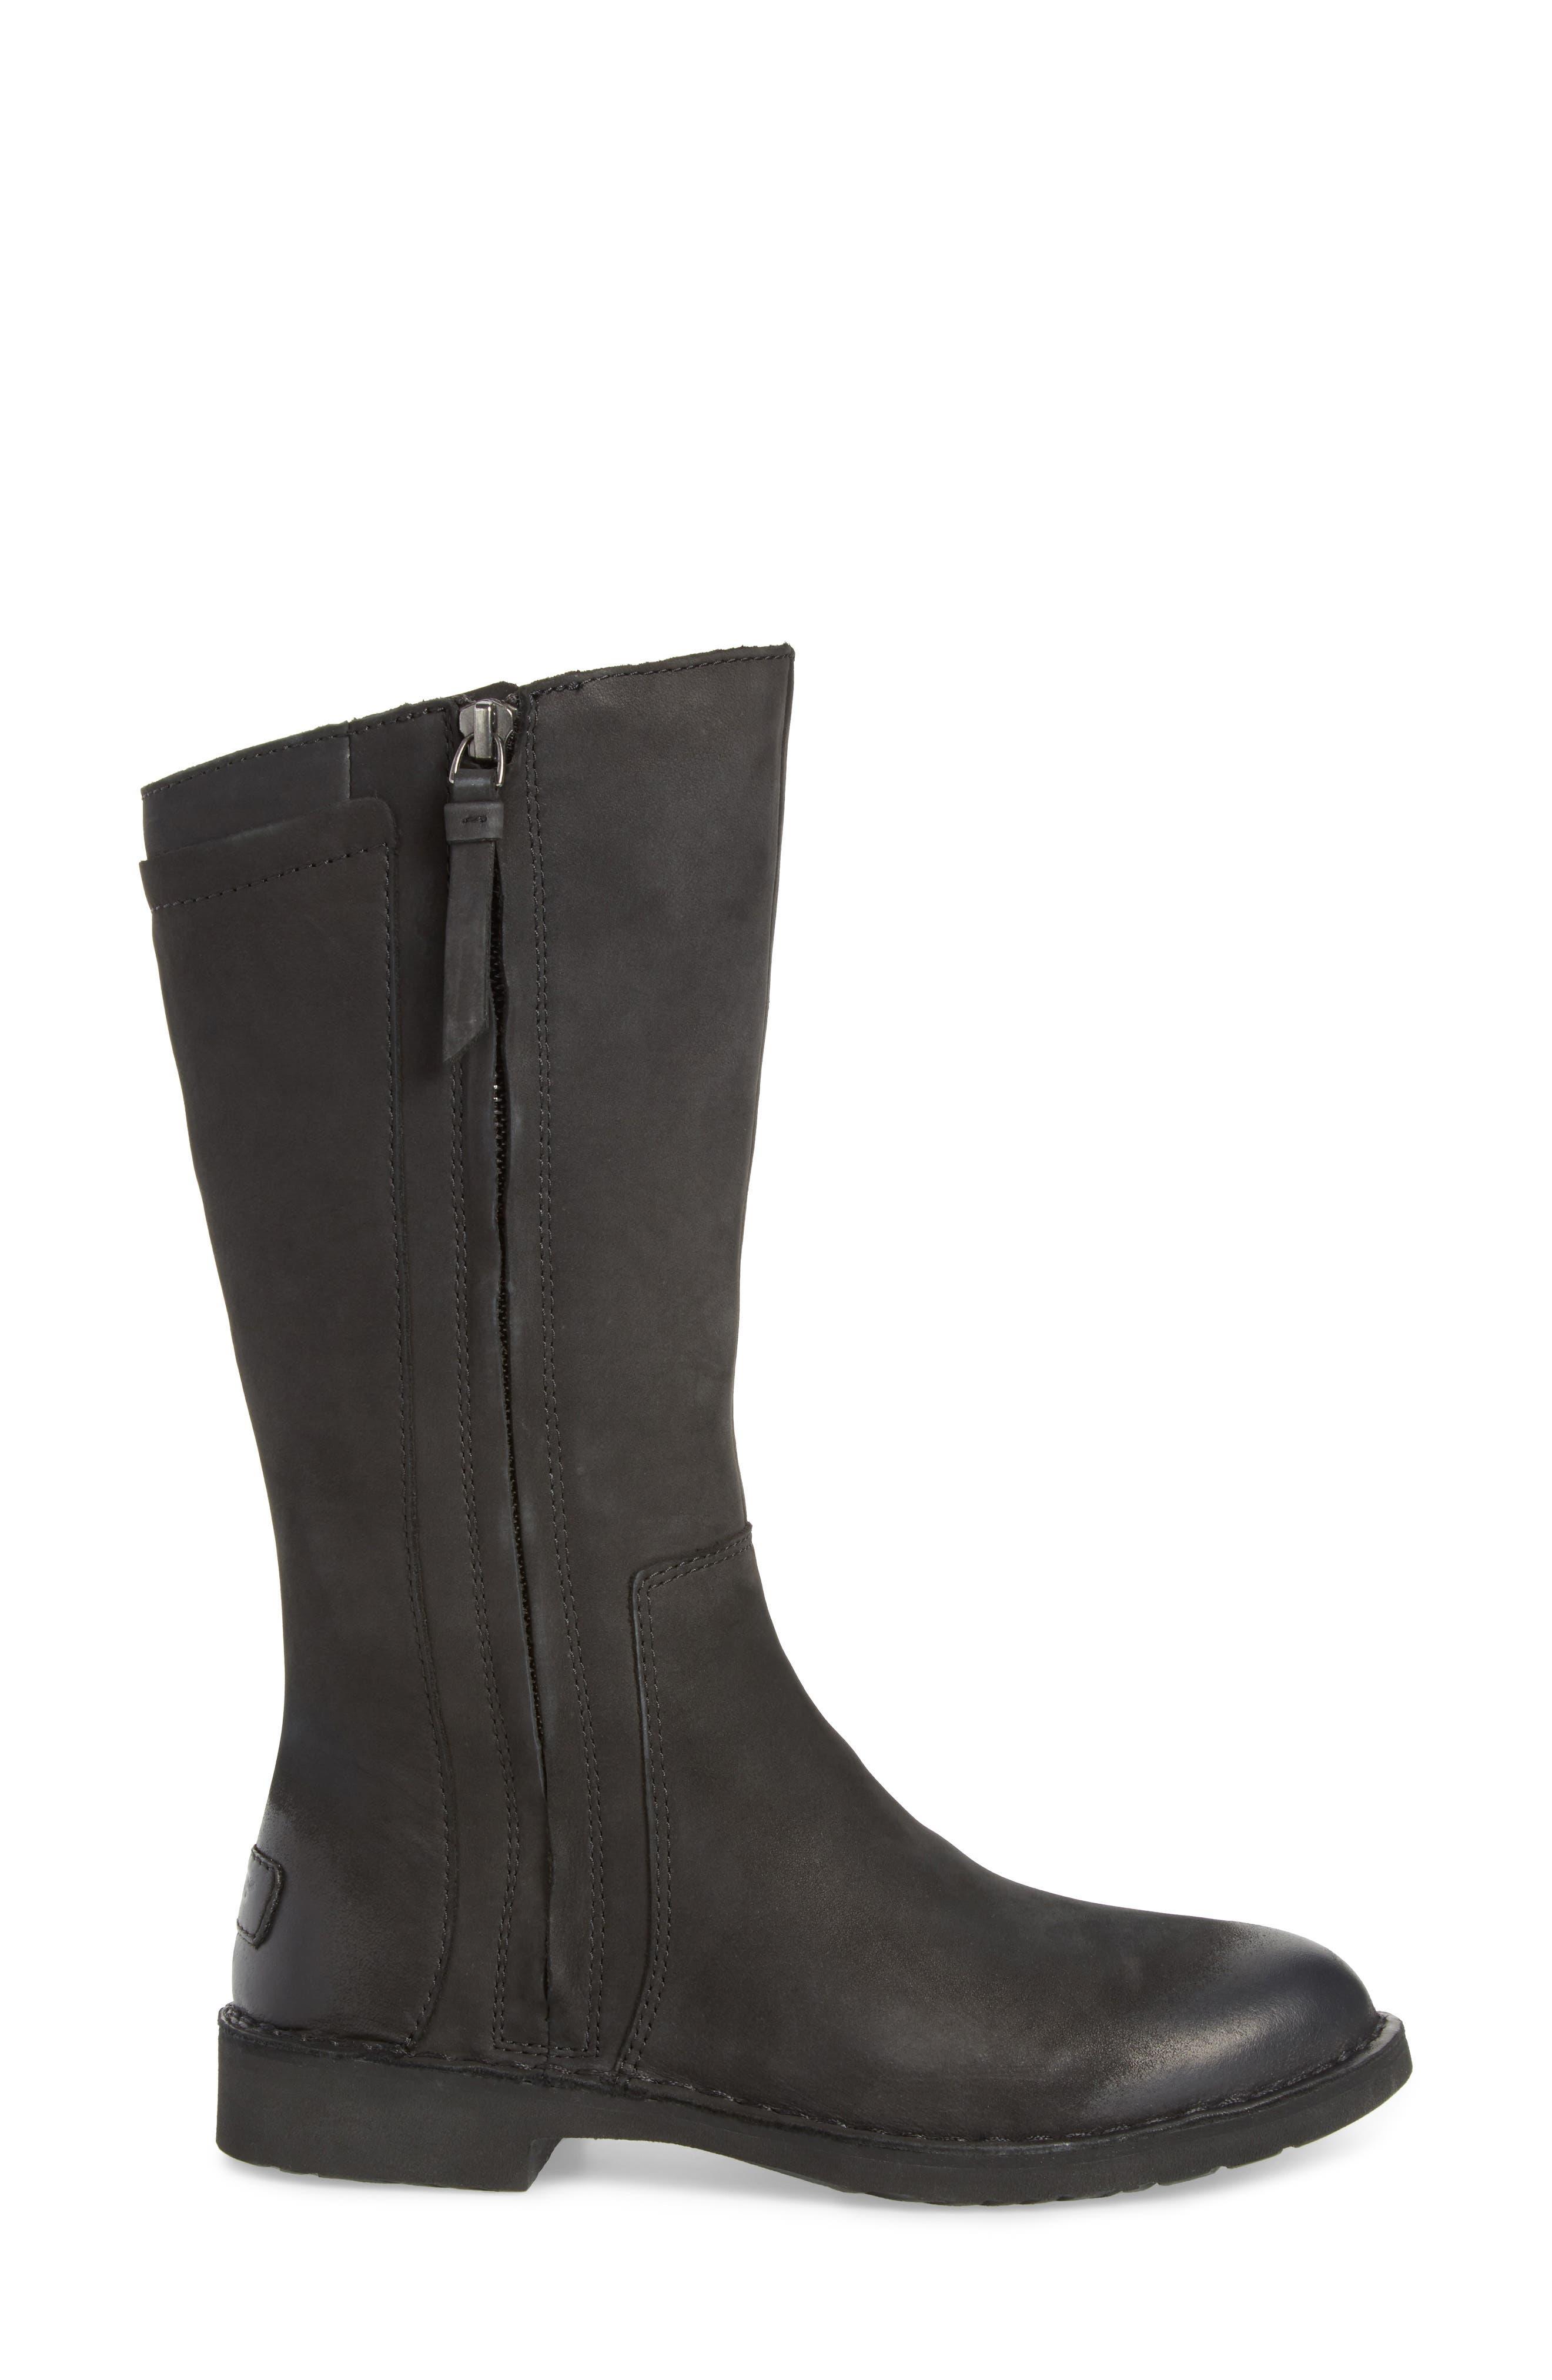 Elly Boot,                             Alternate thumbnail 3, color,                             Black Nubuck Leather